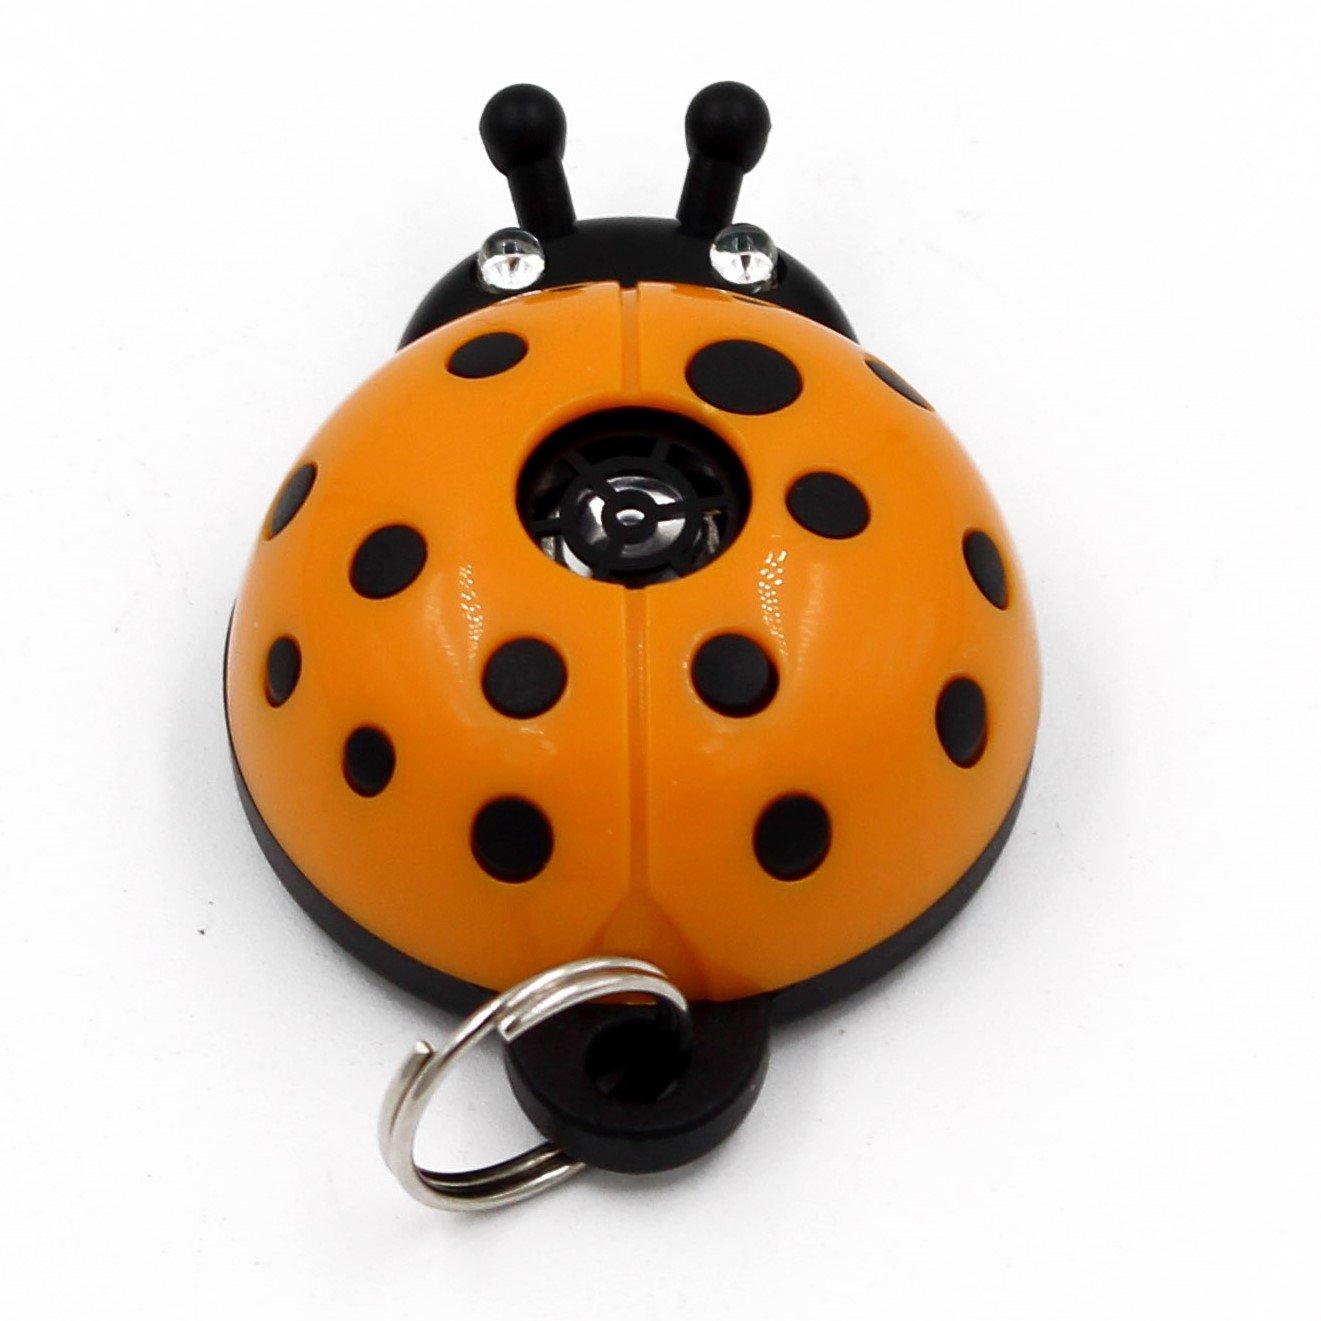 Roxy Ruff Utrasonic Fleas and Ticks Repeller (Orange Bug Collar Attachment)